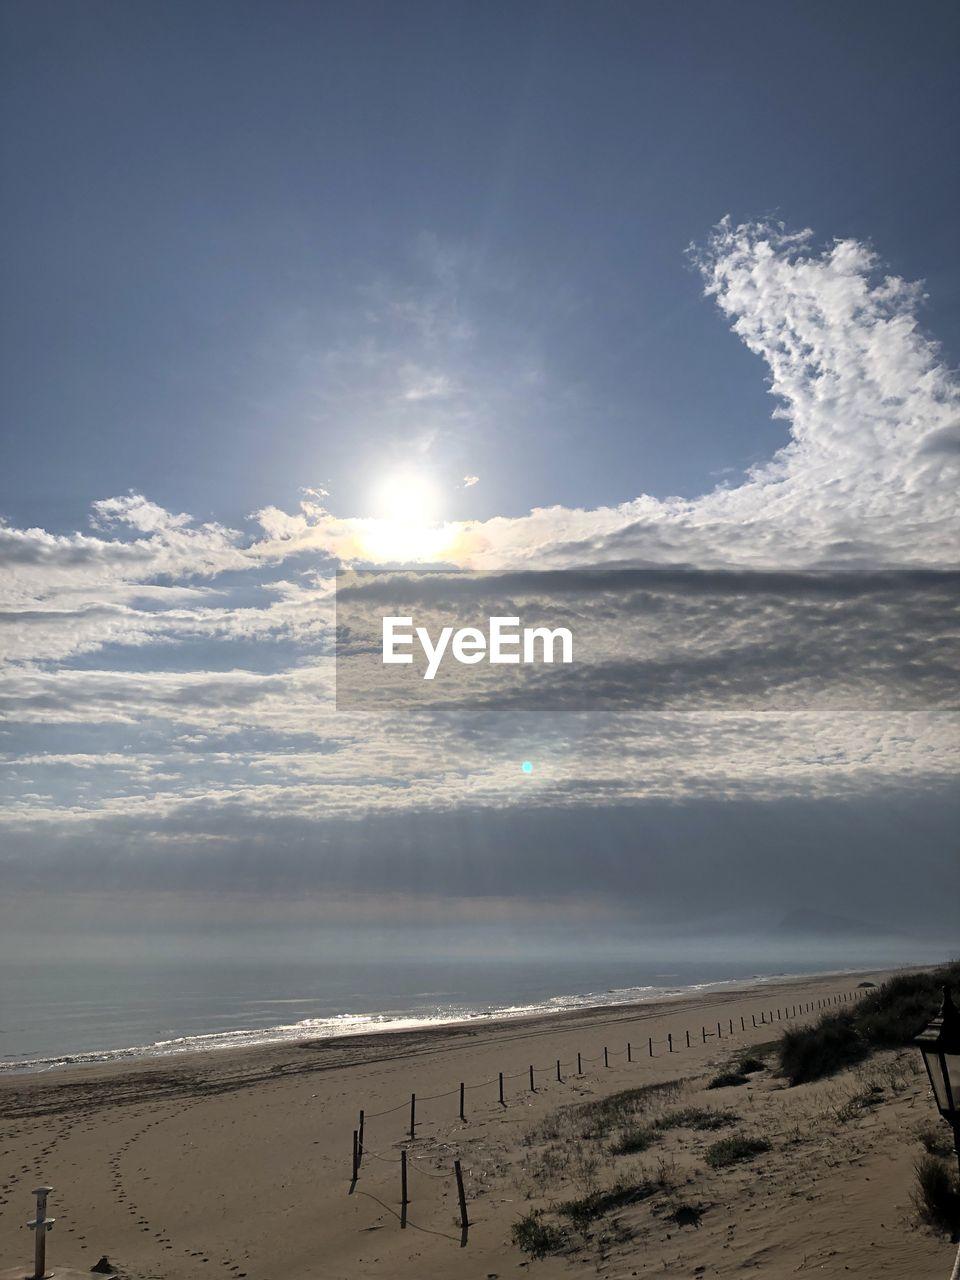 sky, cloud - sky, beauty in nature, scenics - nature, land, water, beach, sea, nature, sunlight, tranquil scene, sand, tranquility, sun, non-urban scene, day, idyllic, no people, horizon, outdoors, horizon over water, bright